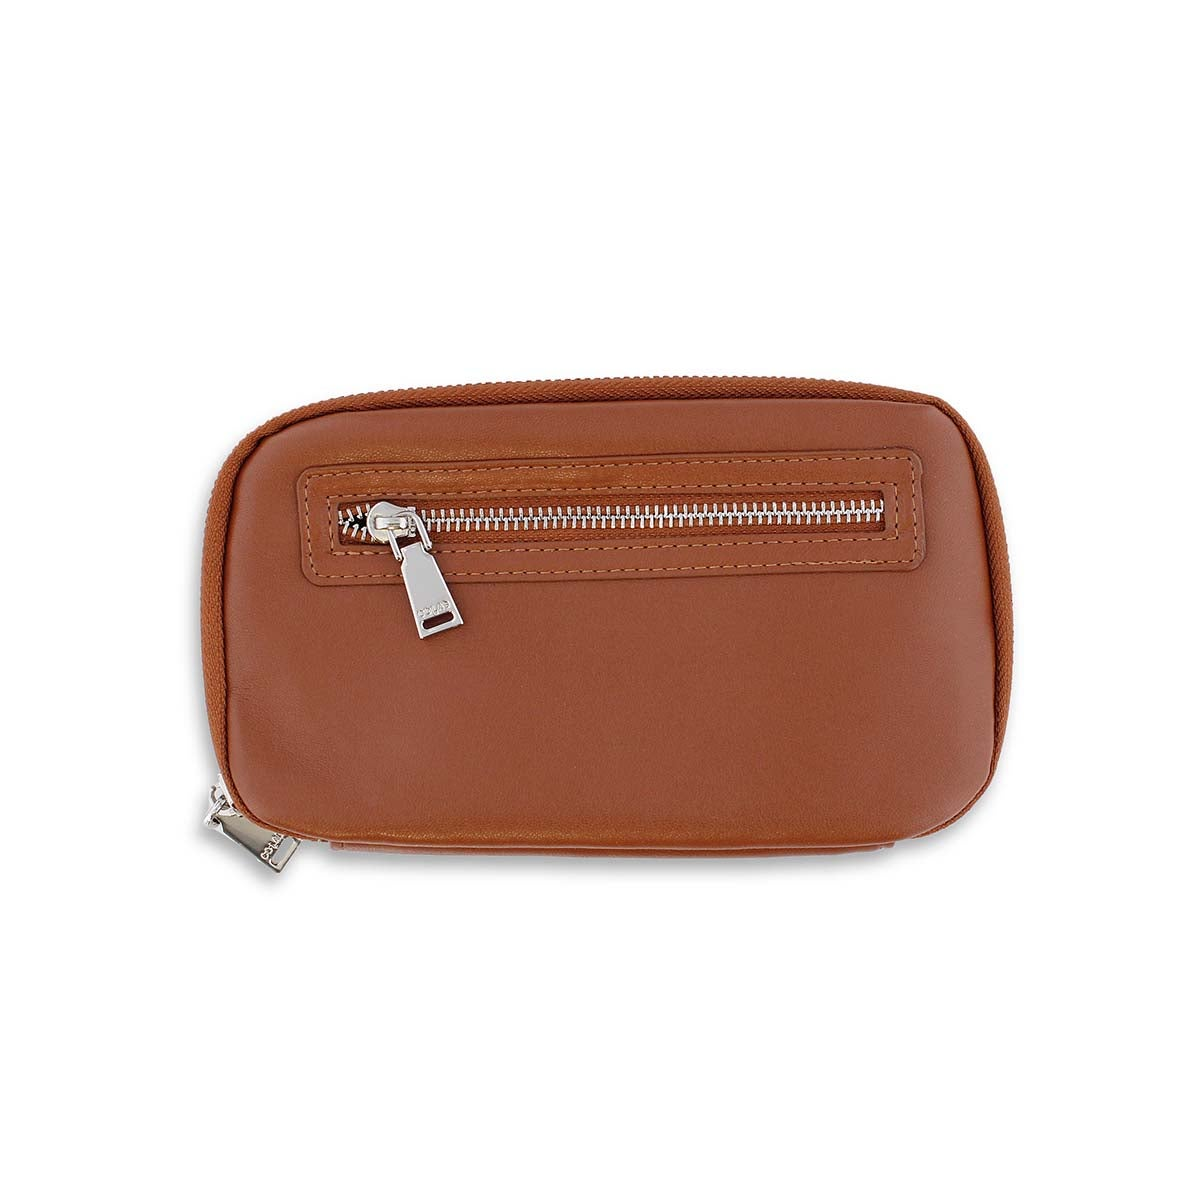 Lds Nappa World auburn wallet